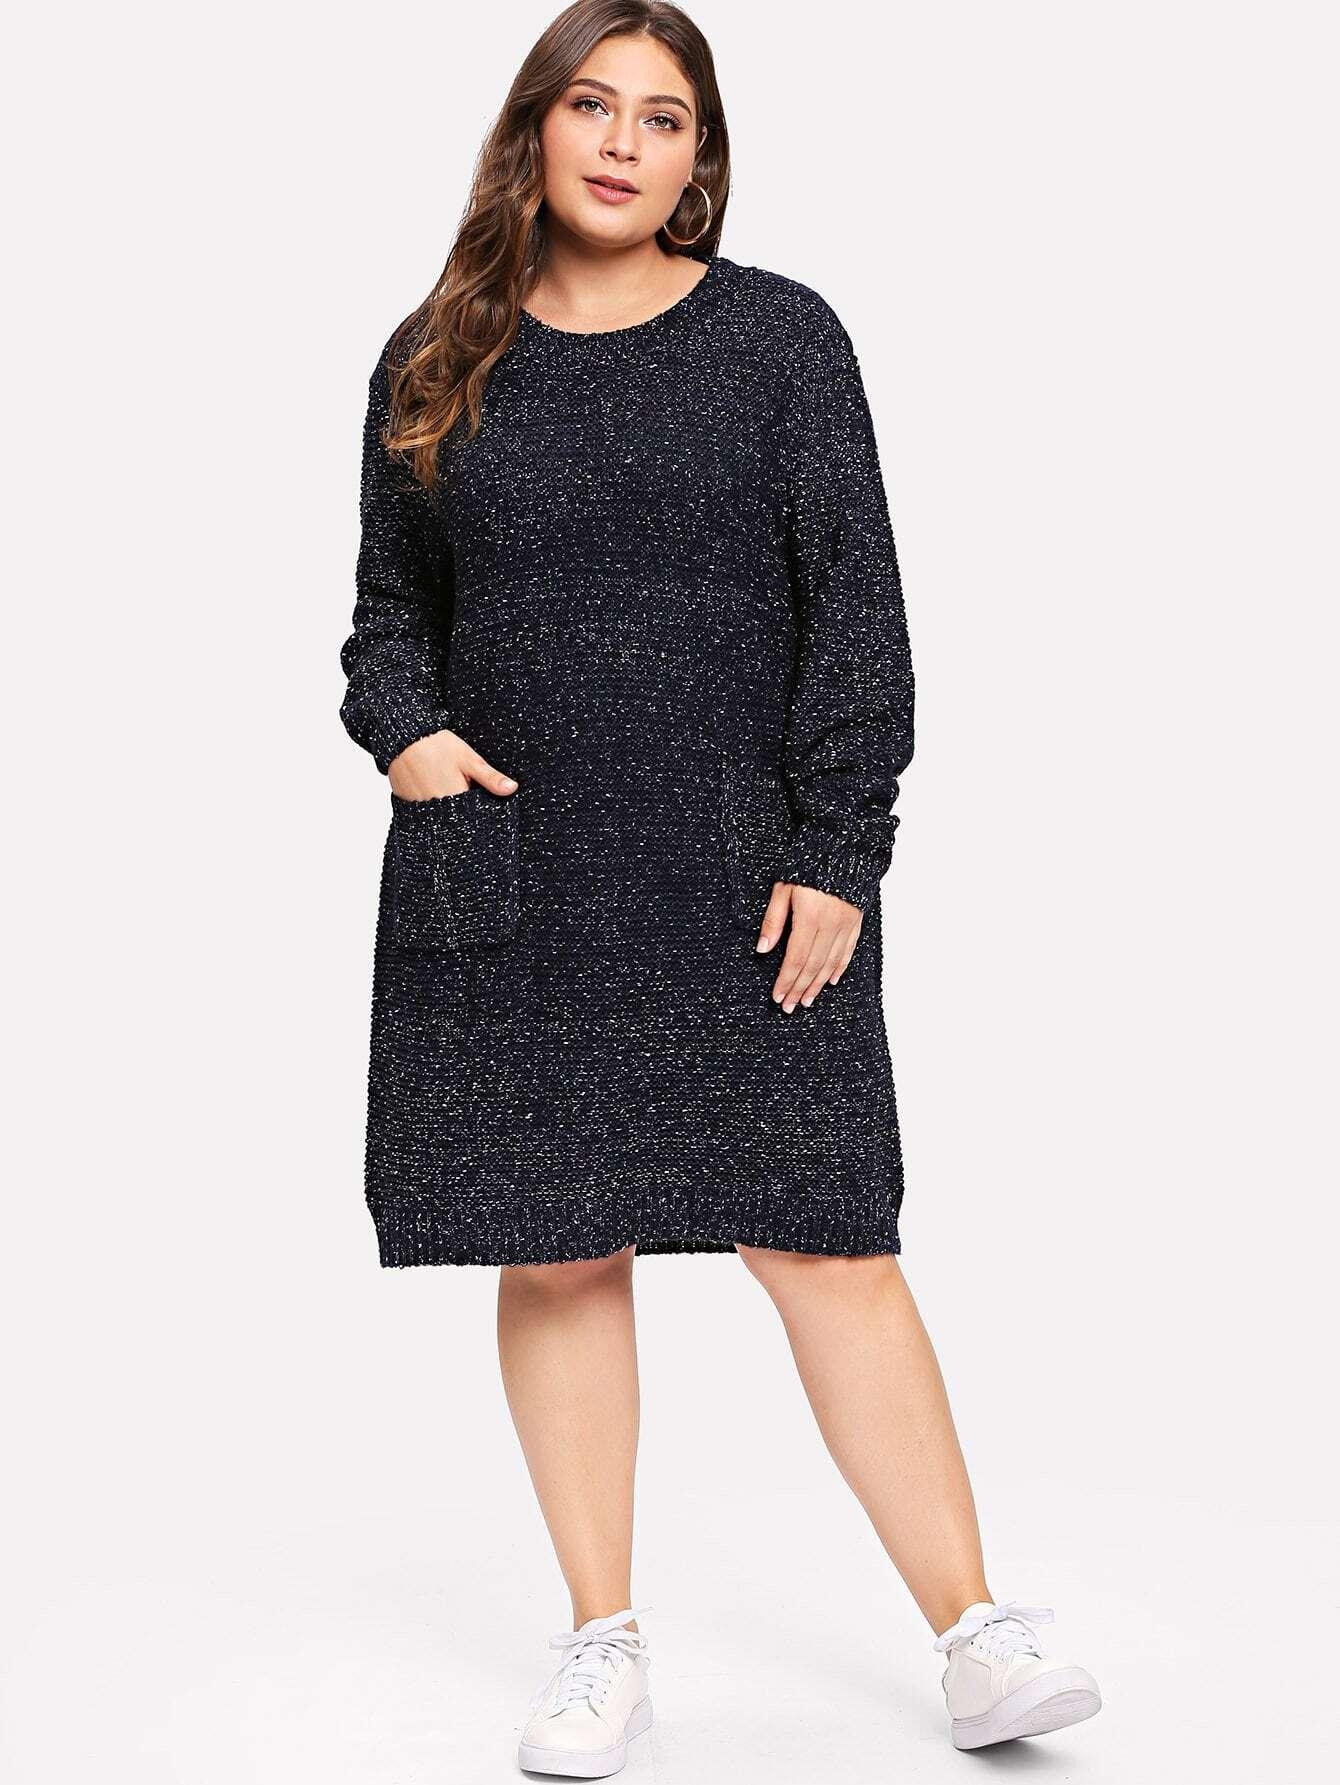 Купить Карманный патч Marled Sweater Dress, Carol, SheIn